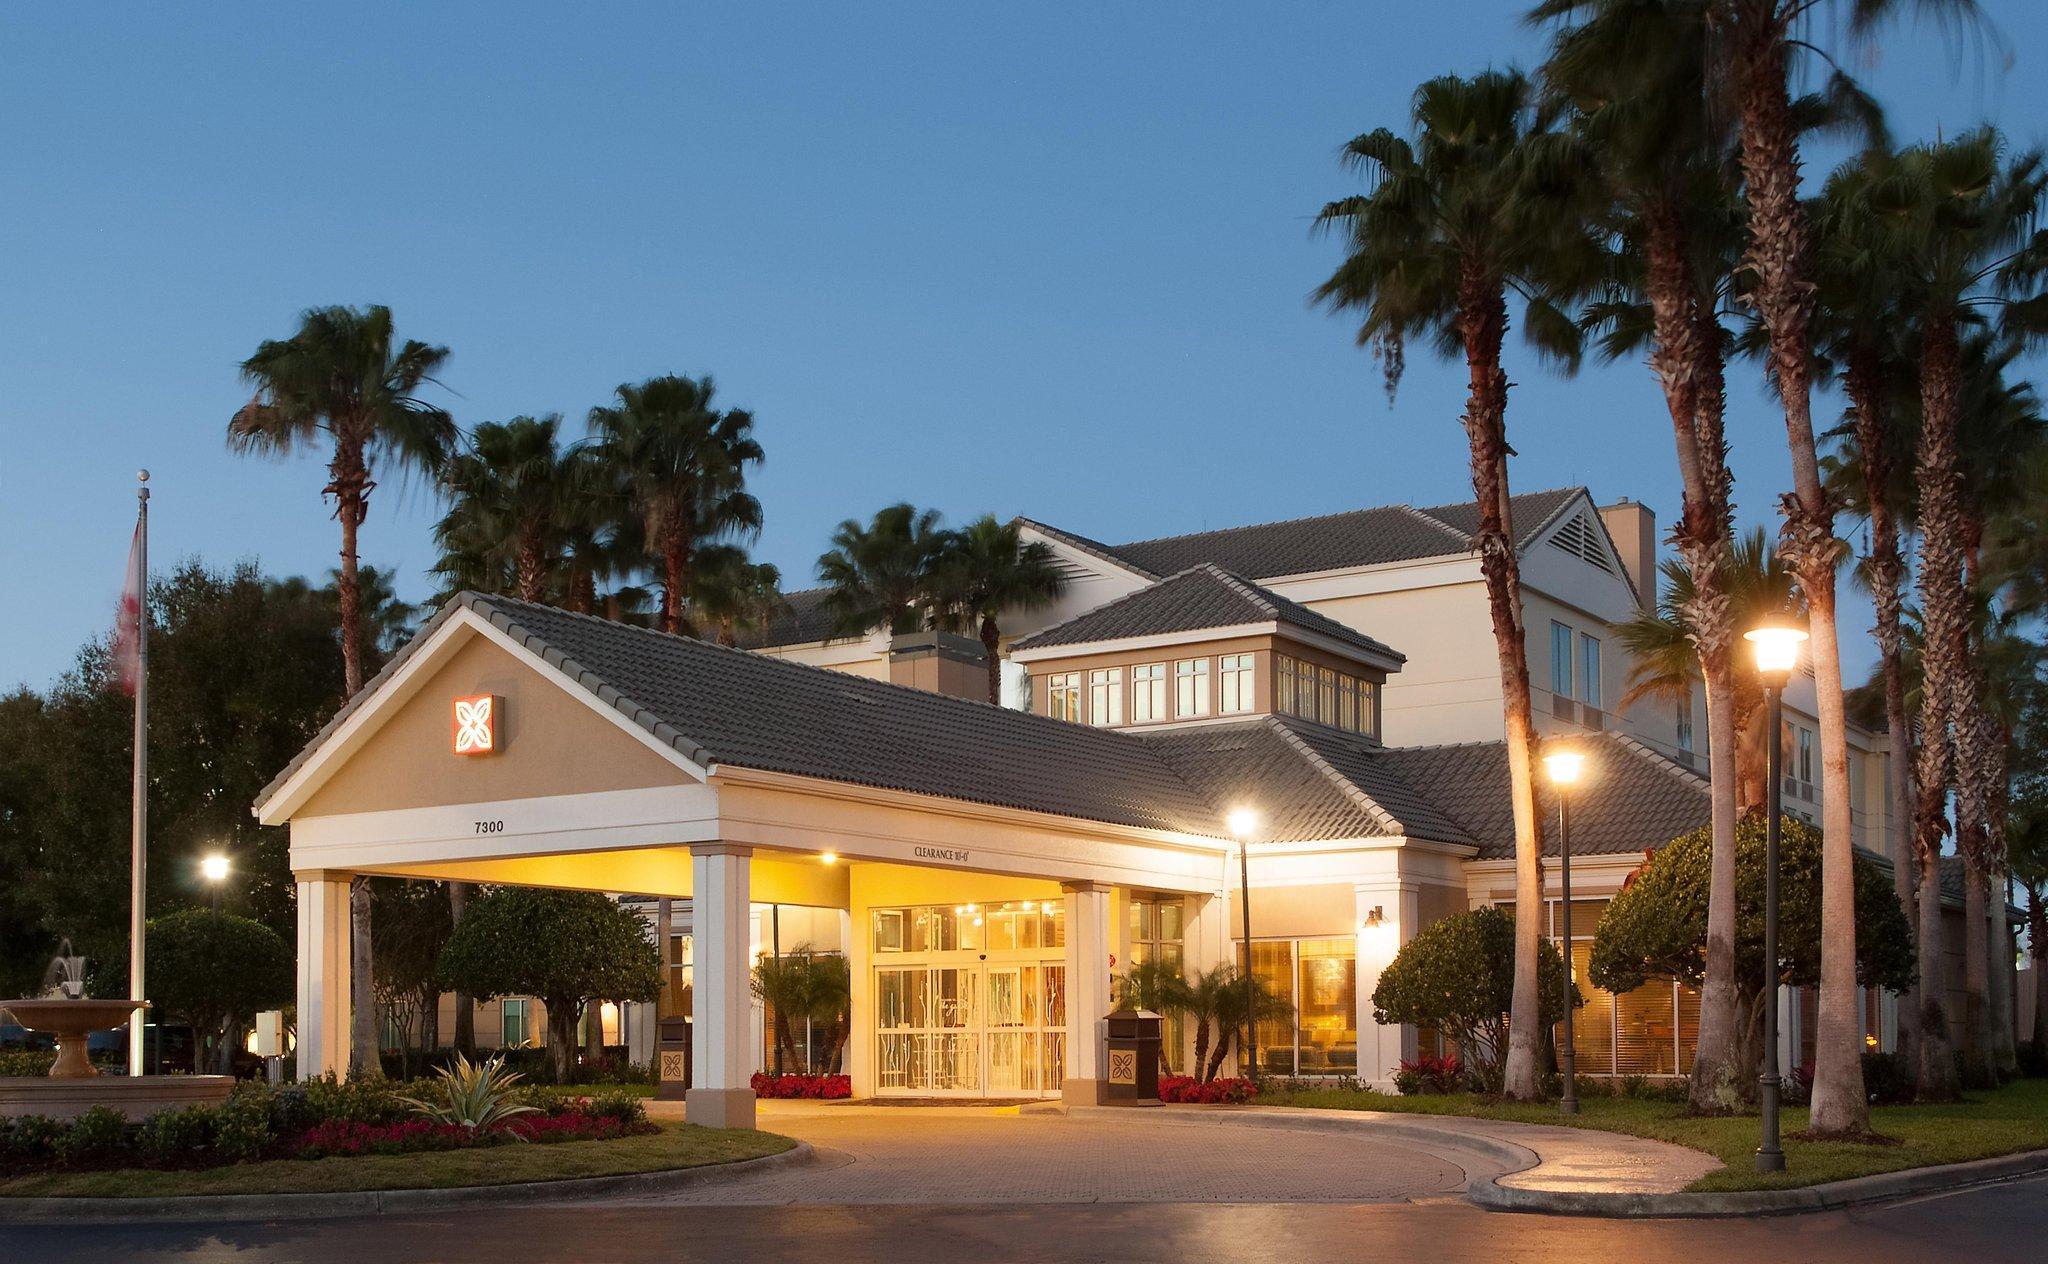 hilton garden inn orlando airport hotel orlando fl. Black Bedroom Furniture Sets. Home Design Ideas